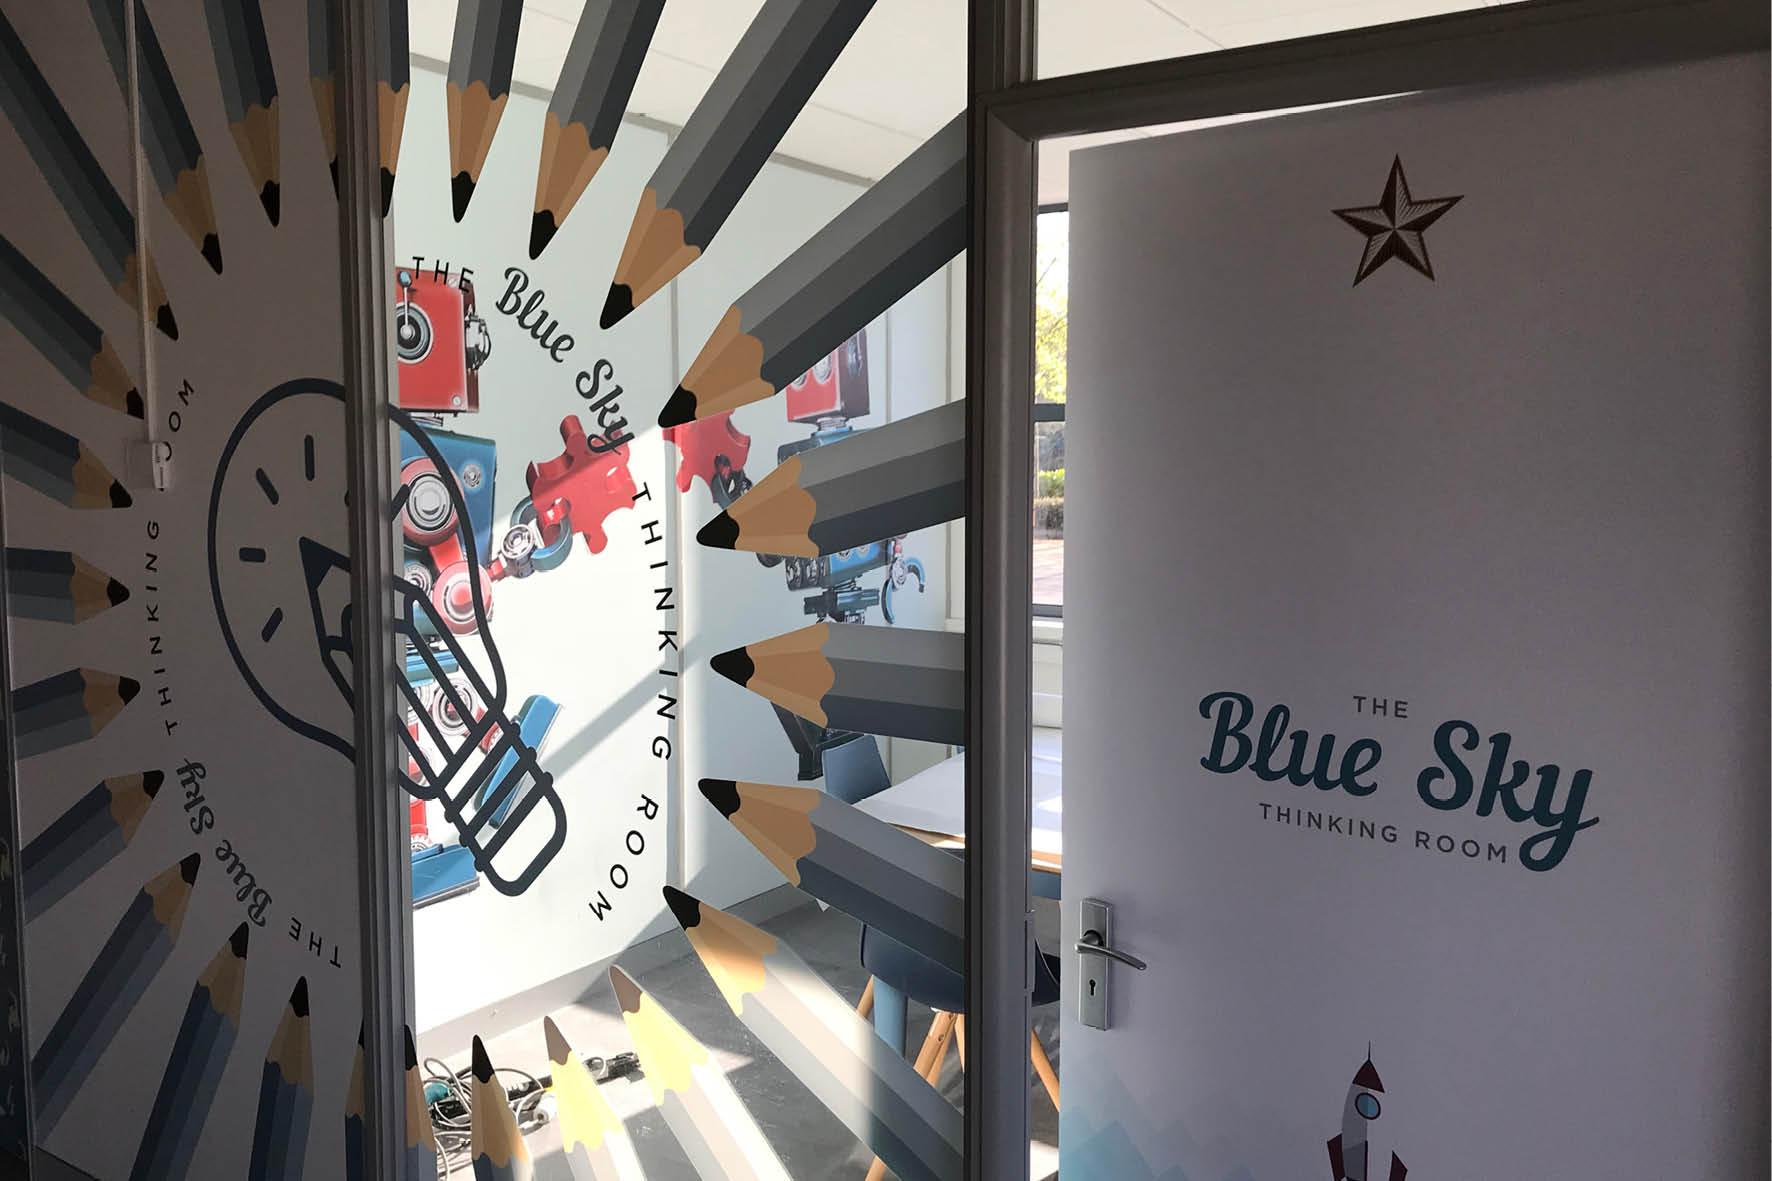 Leeds - Blue Sky Room